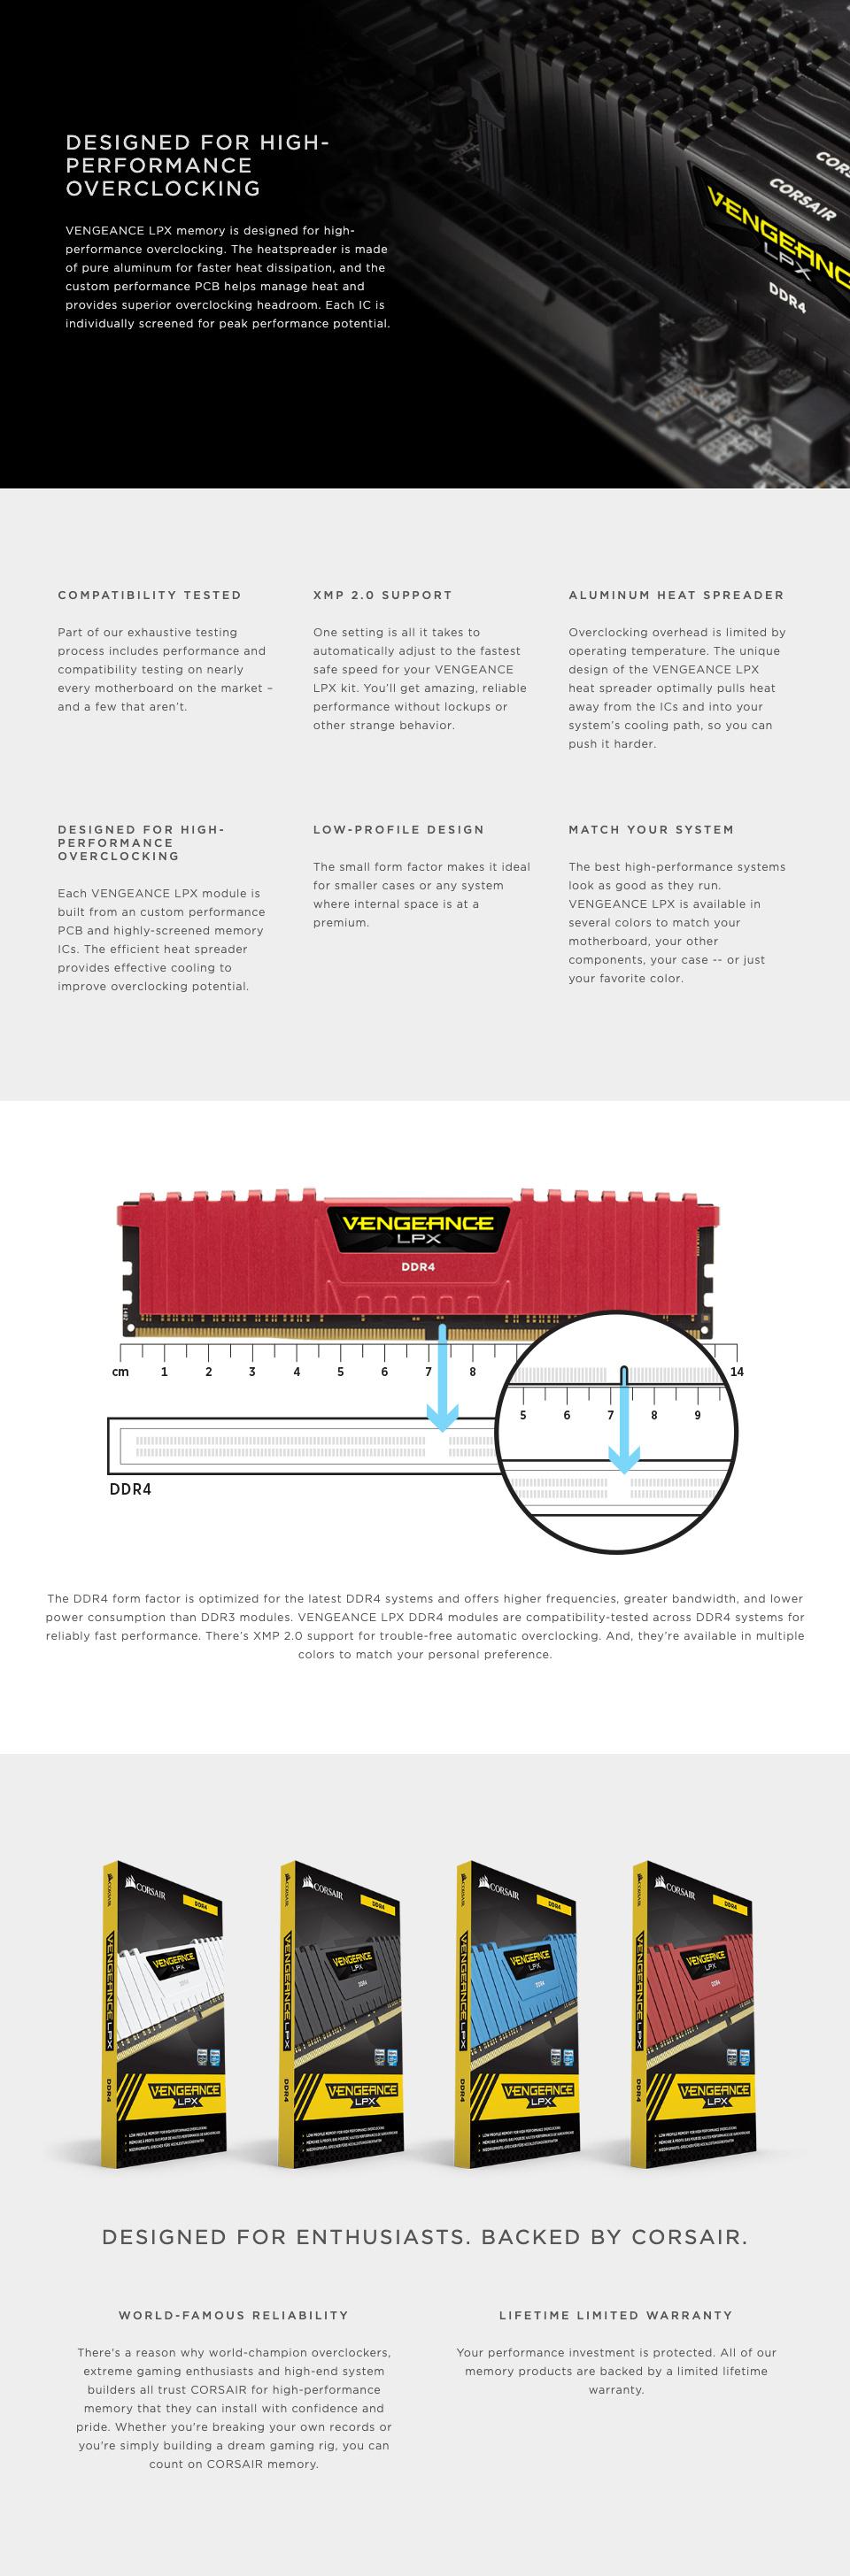 Corsair Vengeance LPX CMK32GX4M2Z3200C 32GB (2x16GB) DDR4 features